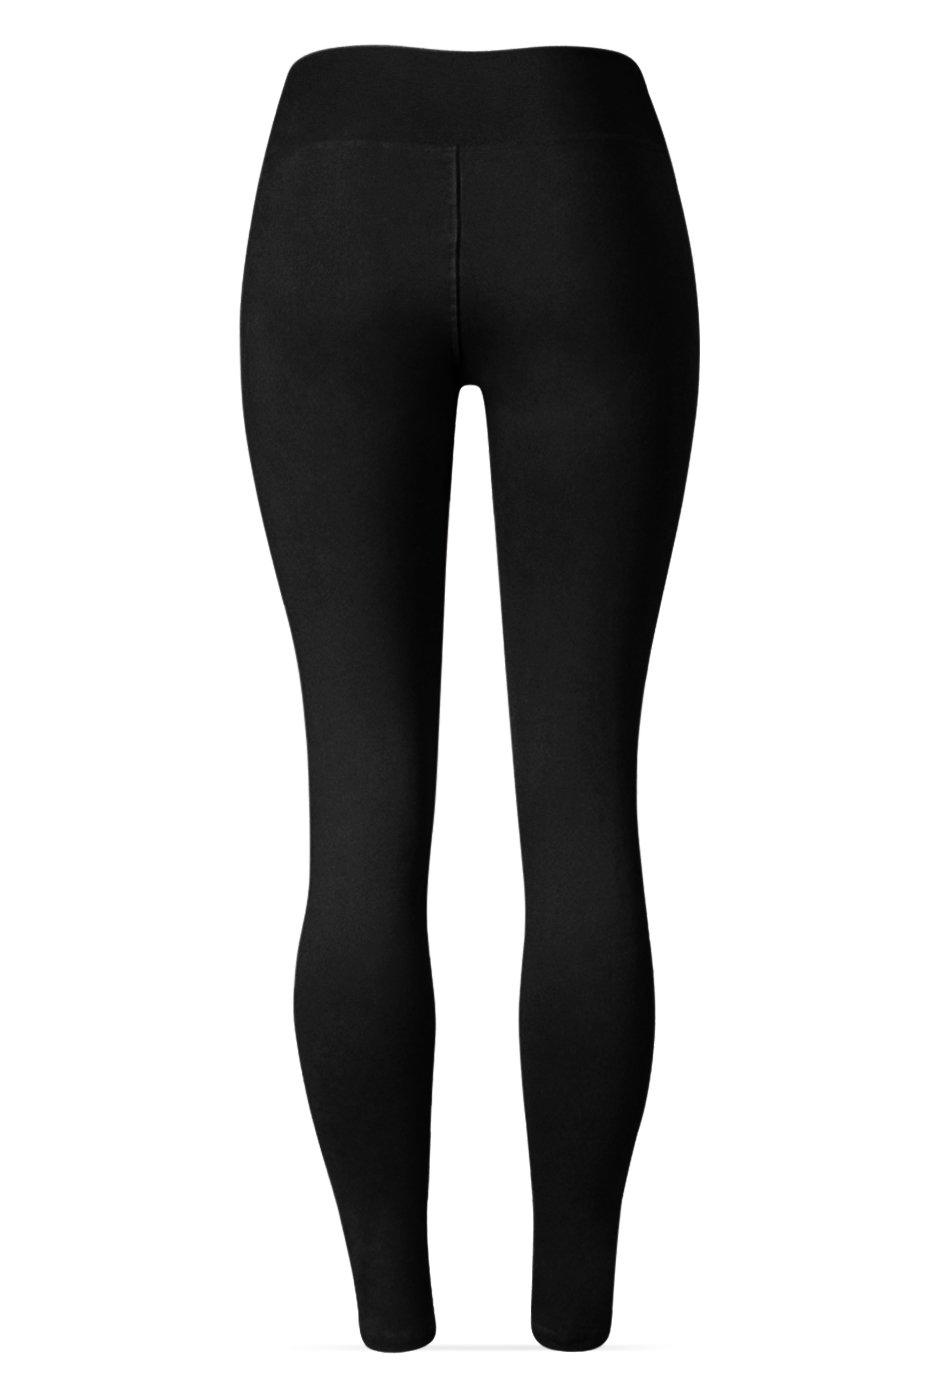 SATINA High Waisted Leggings – 22 Colors – Super Soft Full Length Opaque Slim (One Size, Black) by Sejora (Image #4)